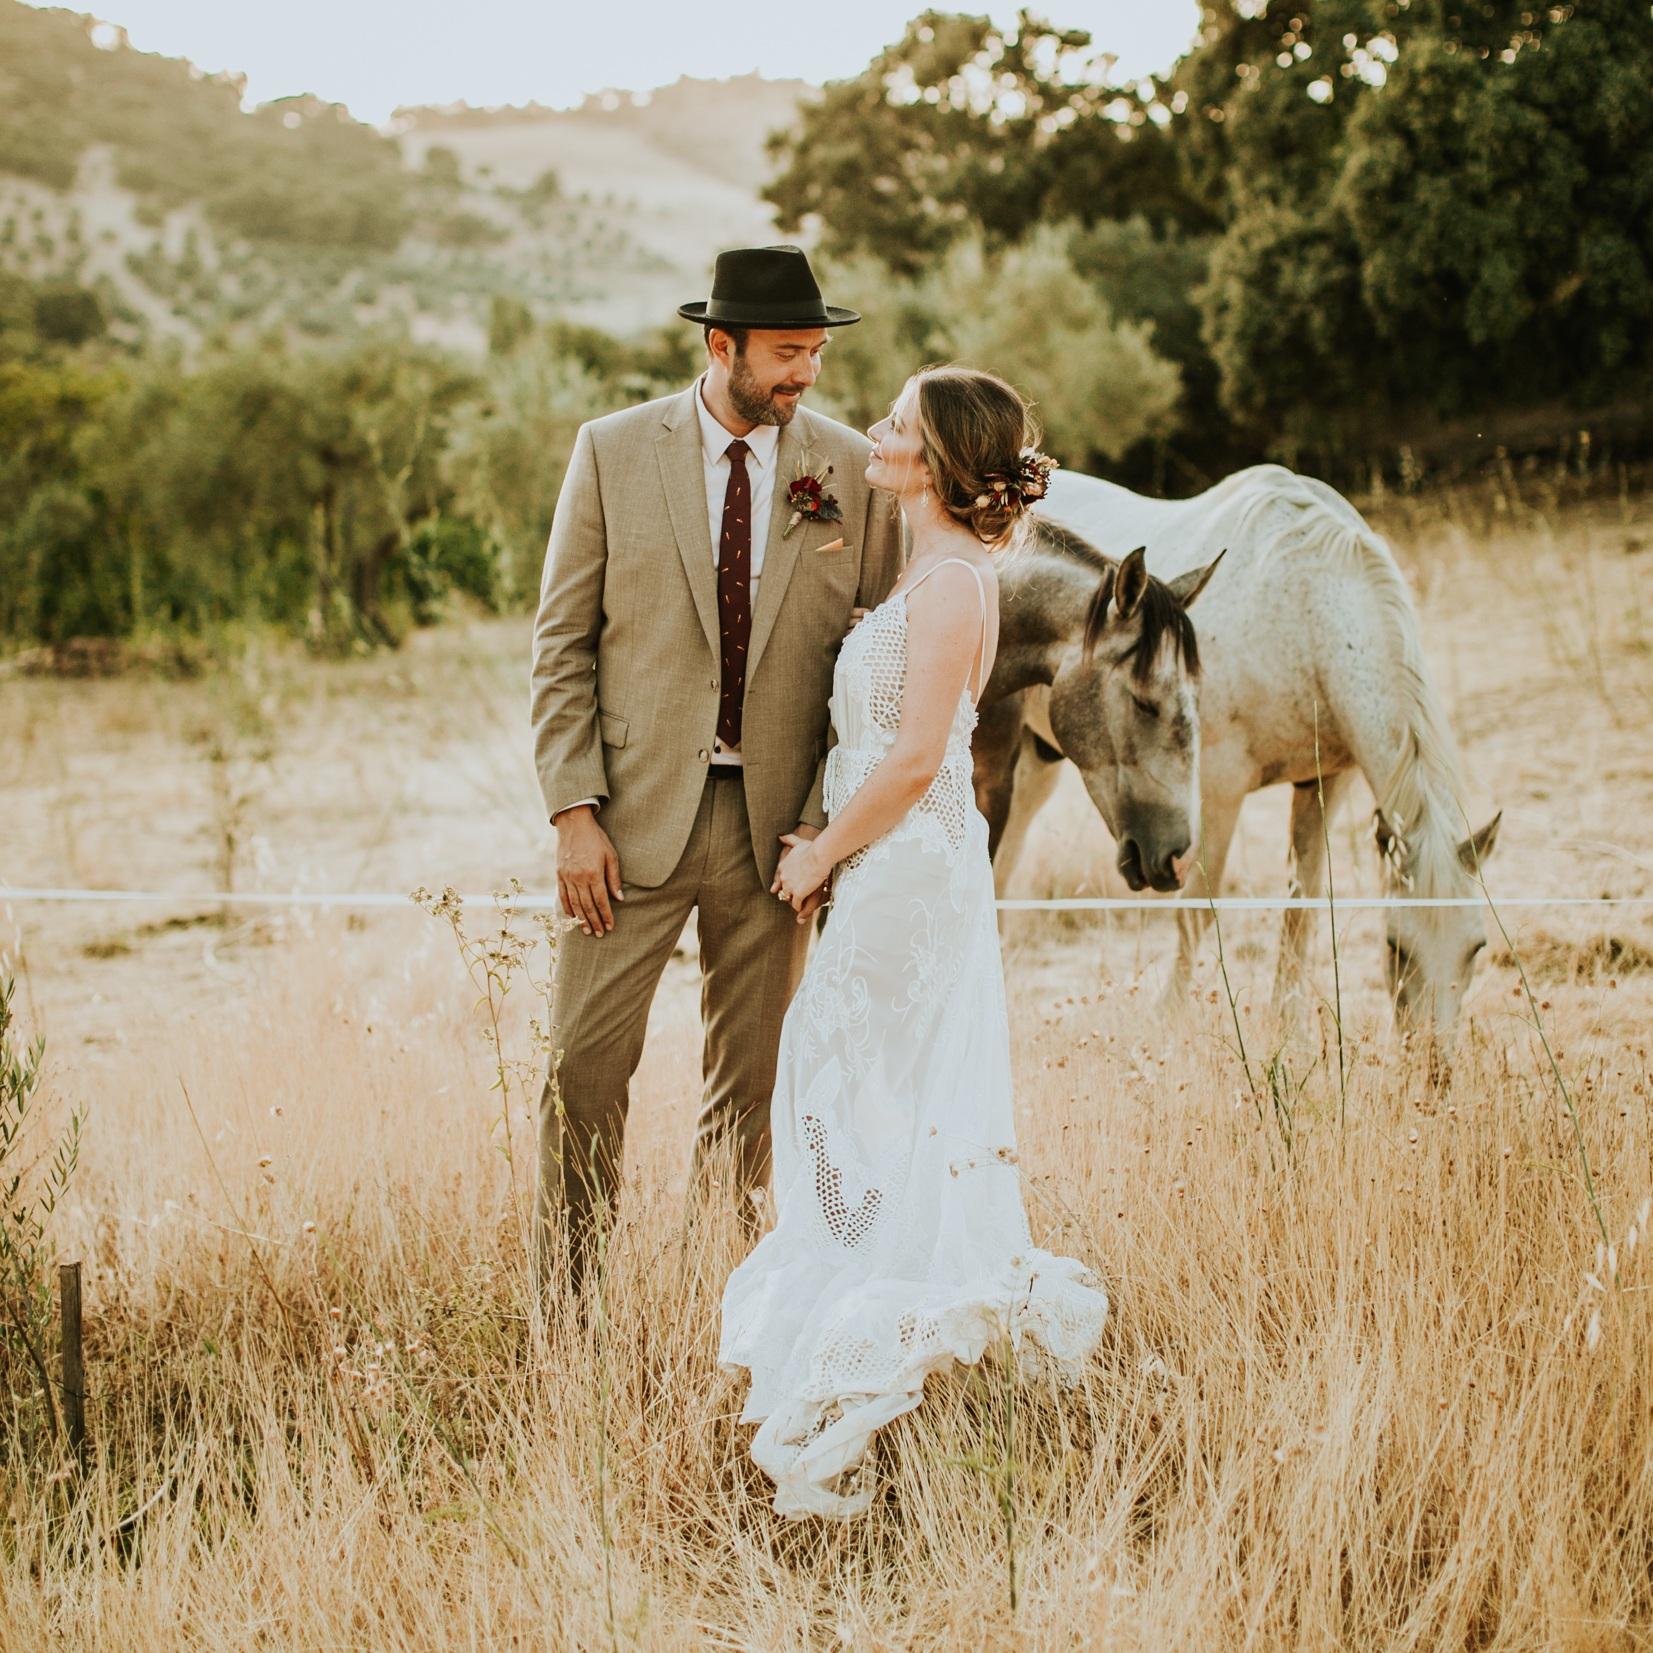 An Intimate Backyard Wedding in Ronda Spain - Andrew + Ferrah